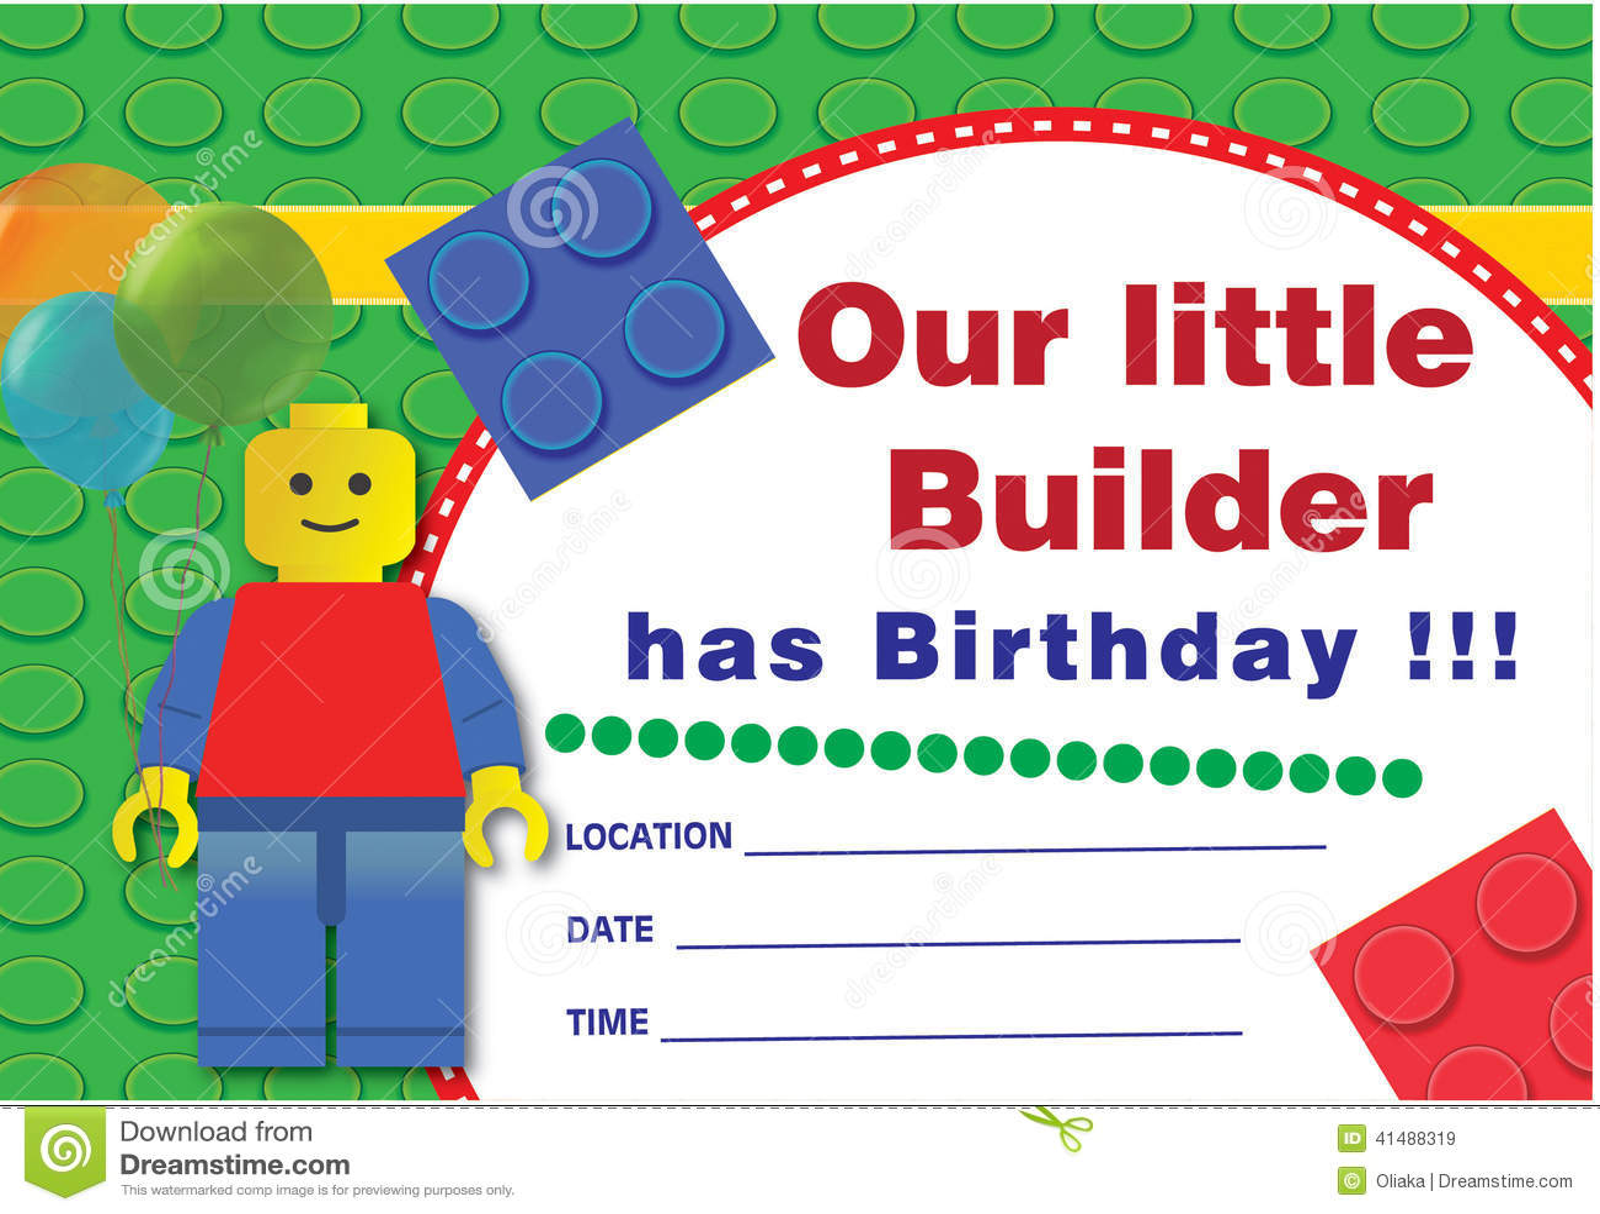 Free Lego Party Invitations – Free Lego Party Invitations